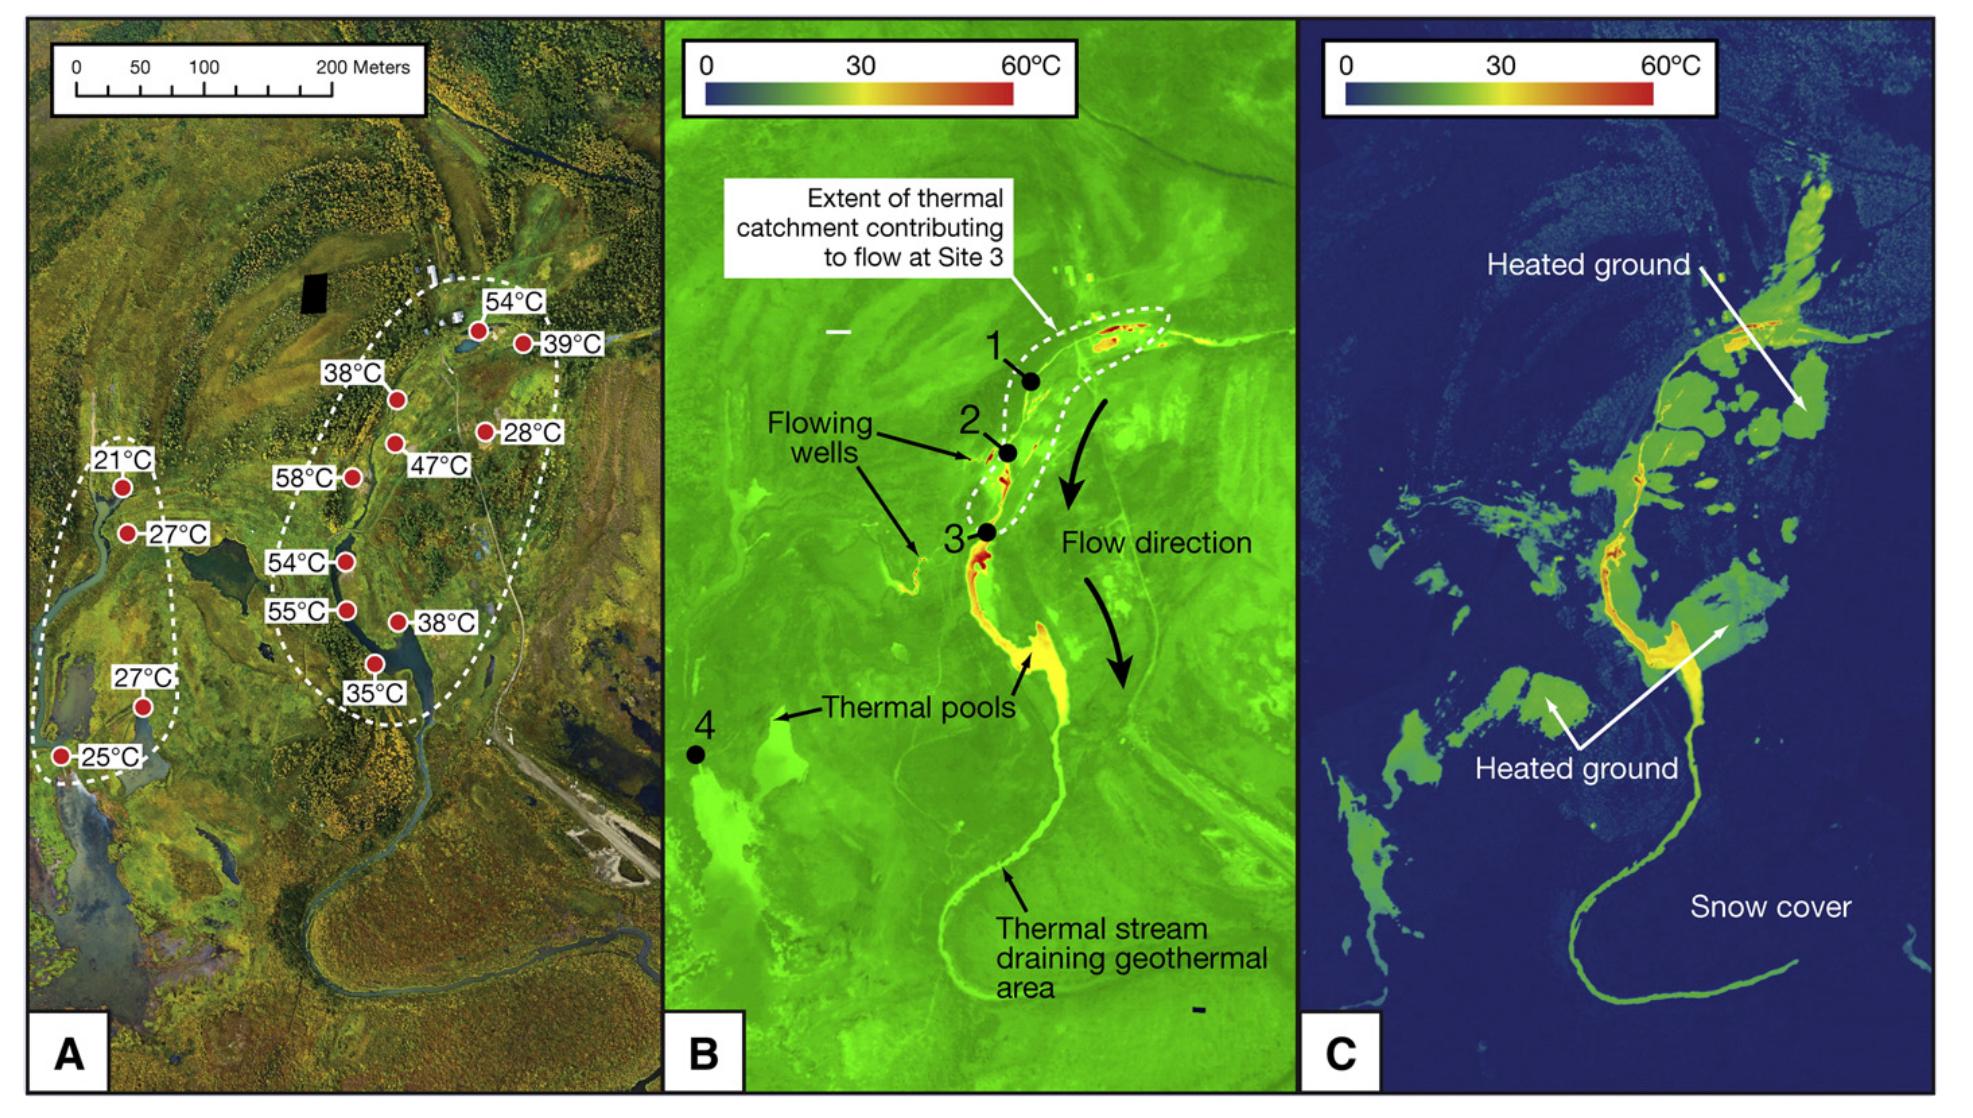 Optical and TIR imagery of Pilgrim Hot Springs. (Haselwimmer et al., 2013)